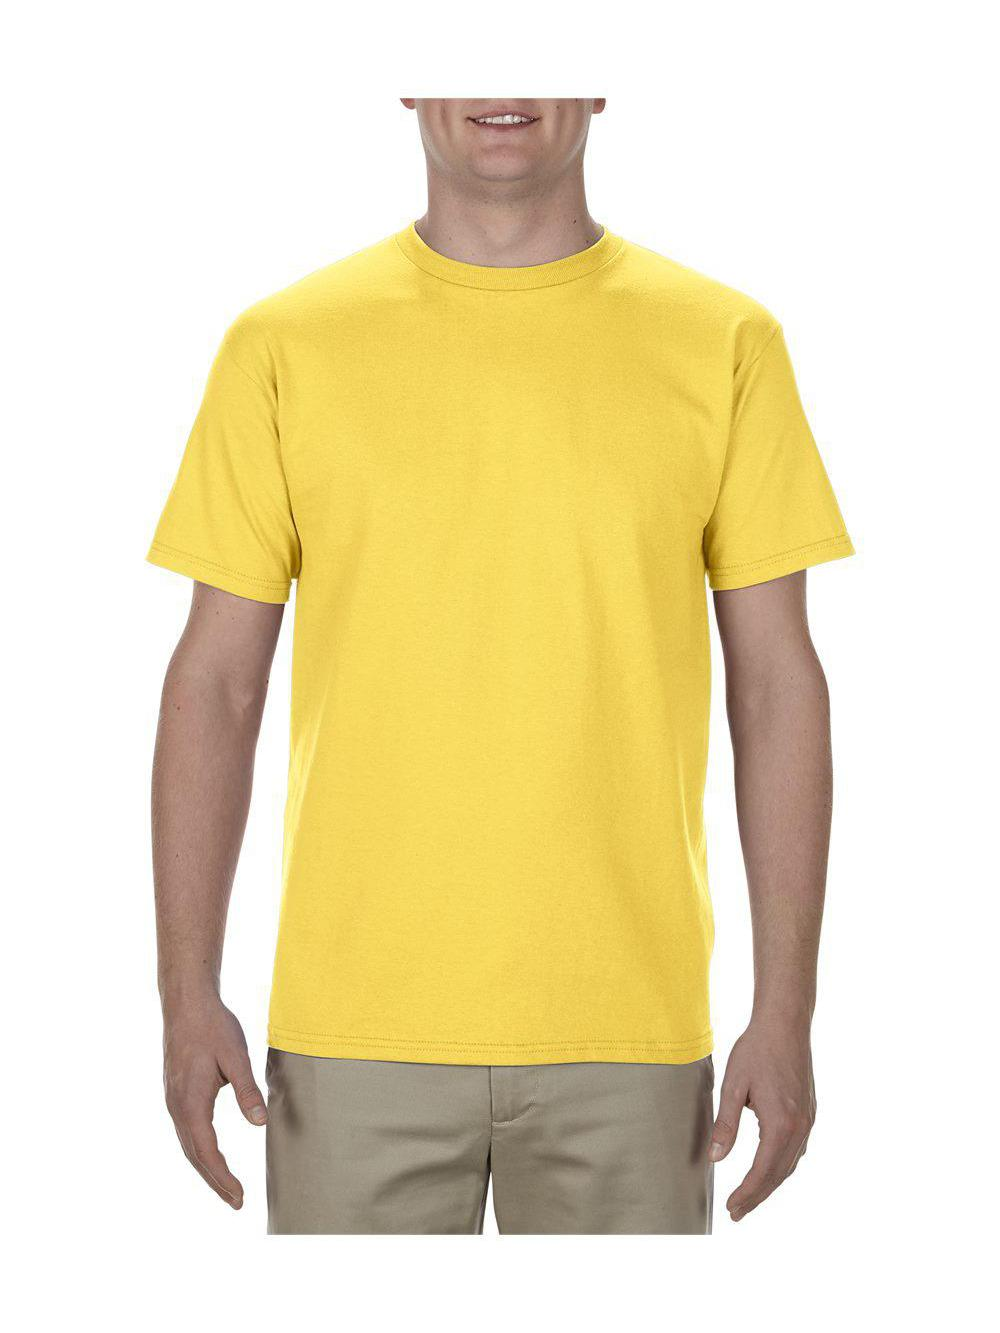 ALSTYLE-Premium-T-Shirt-1701 thumbnail 73